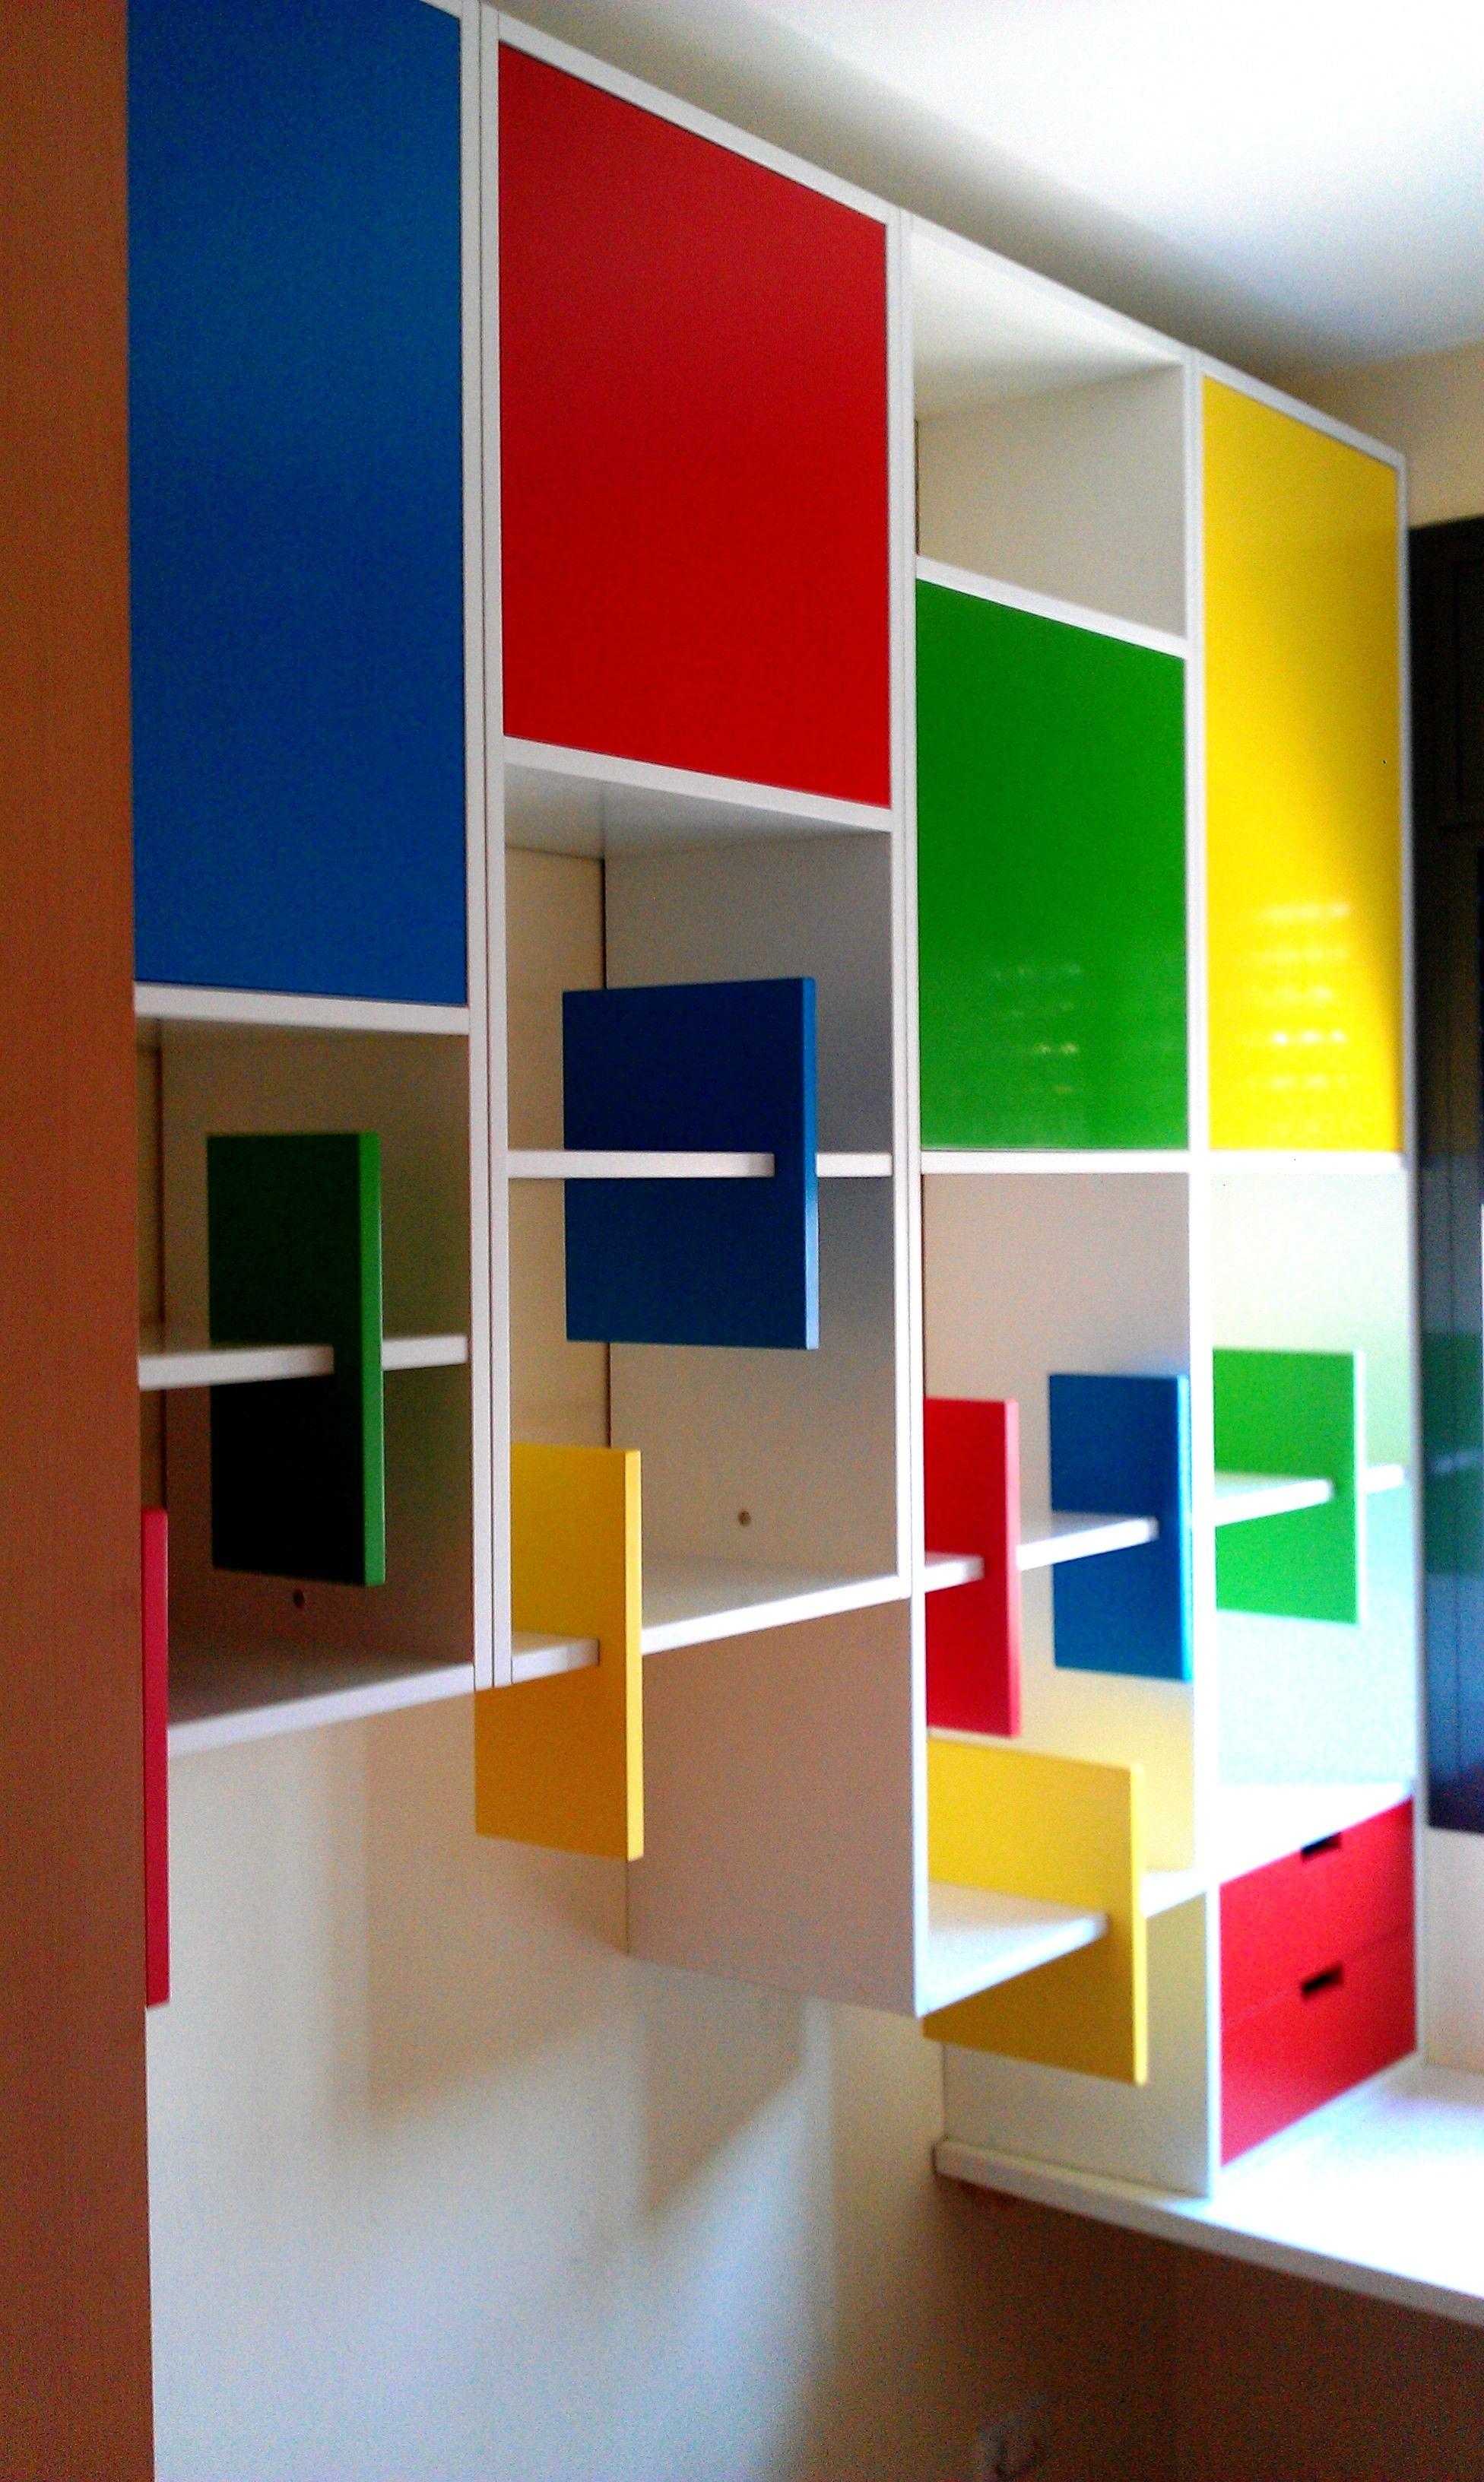 Mueble para habitaci n infantil mobla barcelona pinterest indoor play areas indoor play - Muebles habitacion infantil ...